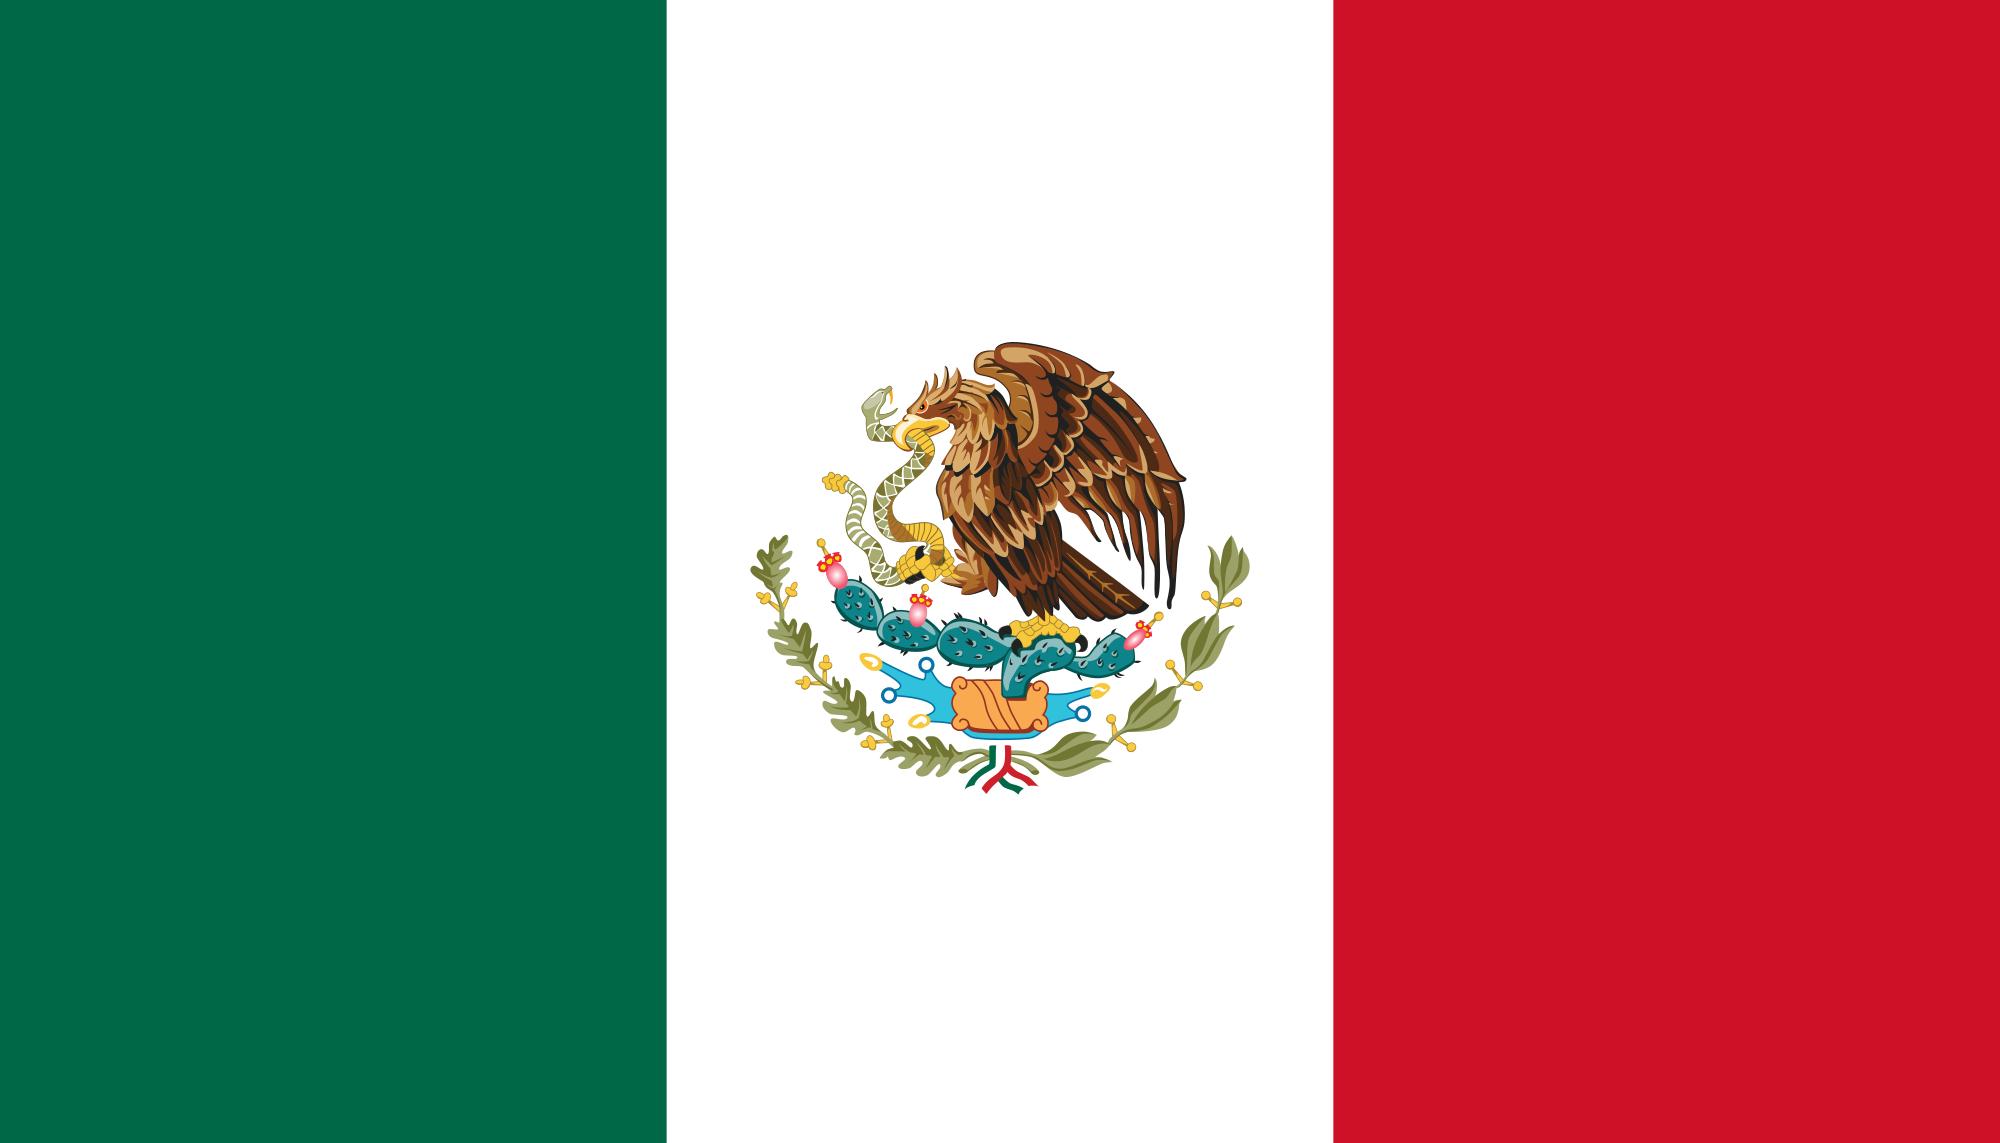 Flag_of_Mexico - Azur Lane Bisoku Zenshin! (Azur Lane) [12/12] (Ligero) (Finalizado)  - Anime Ligero [Descargas]